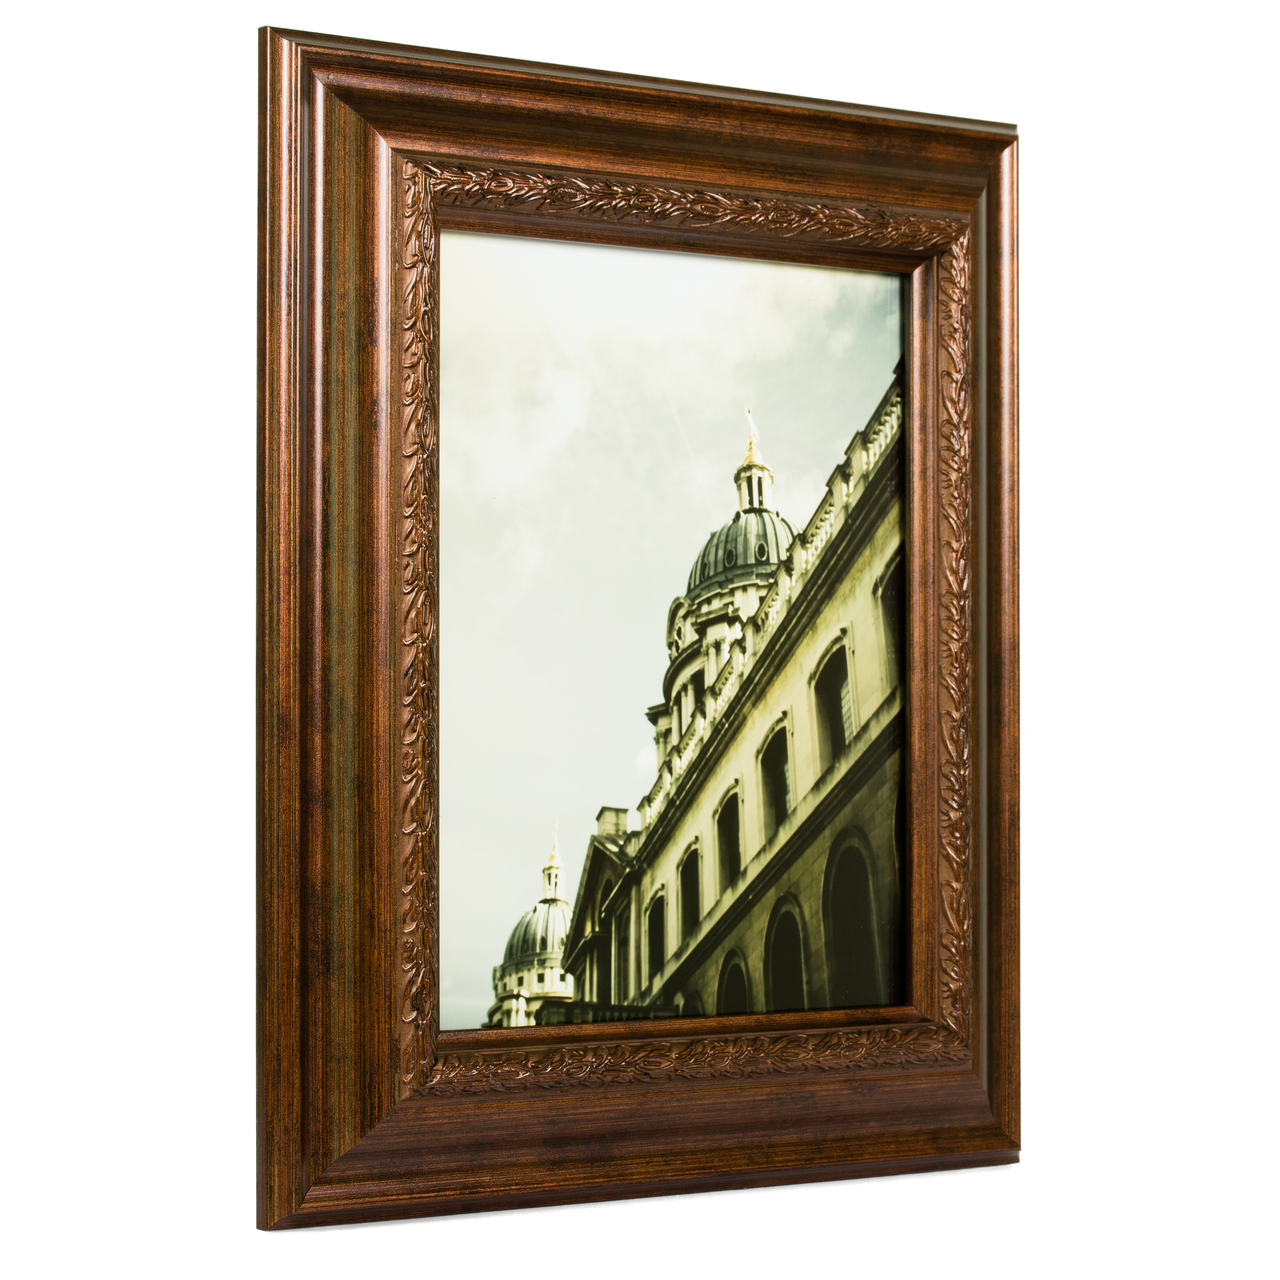 "Pompeii 2.125"", Smoked Bronze Picture Frame"